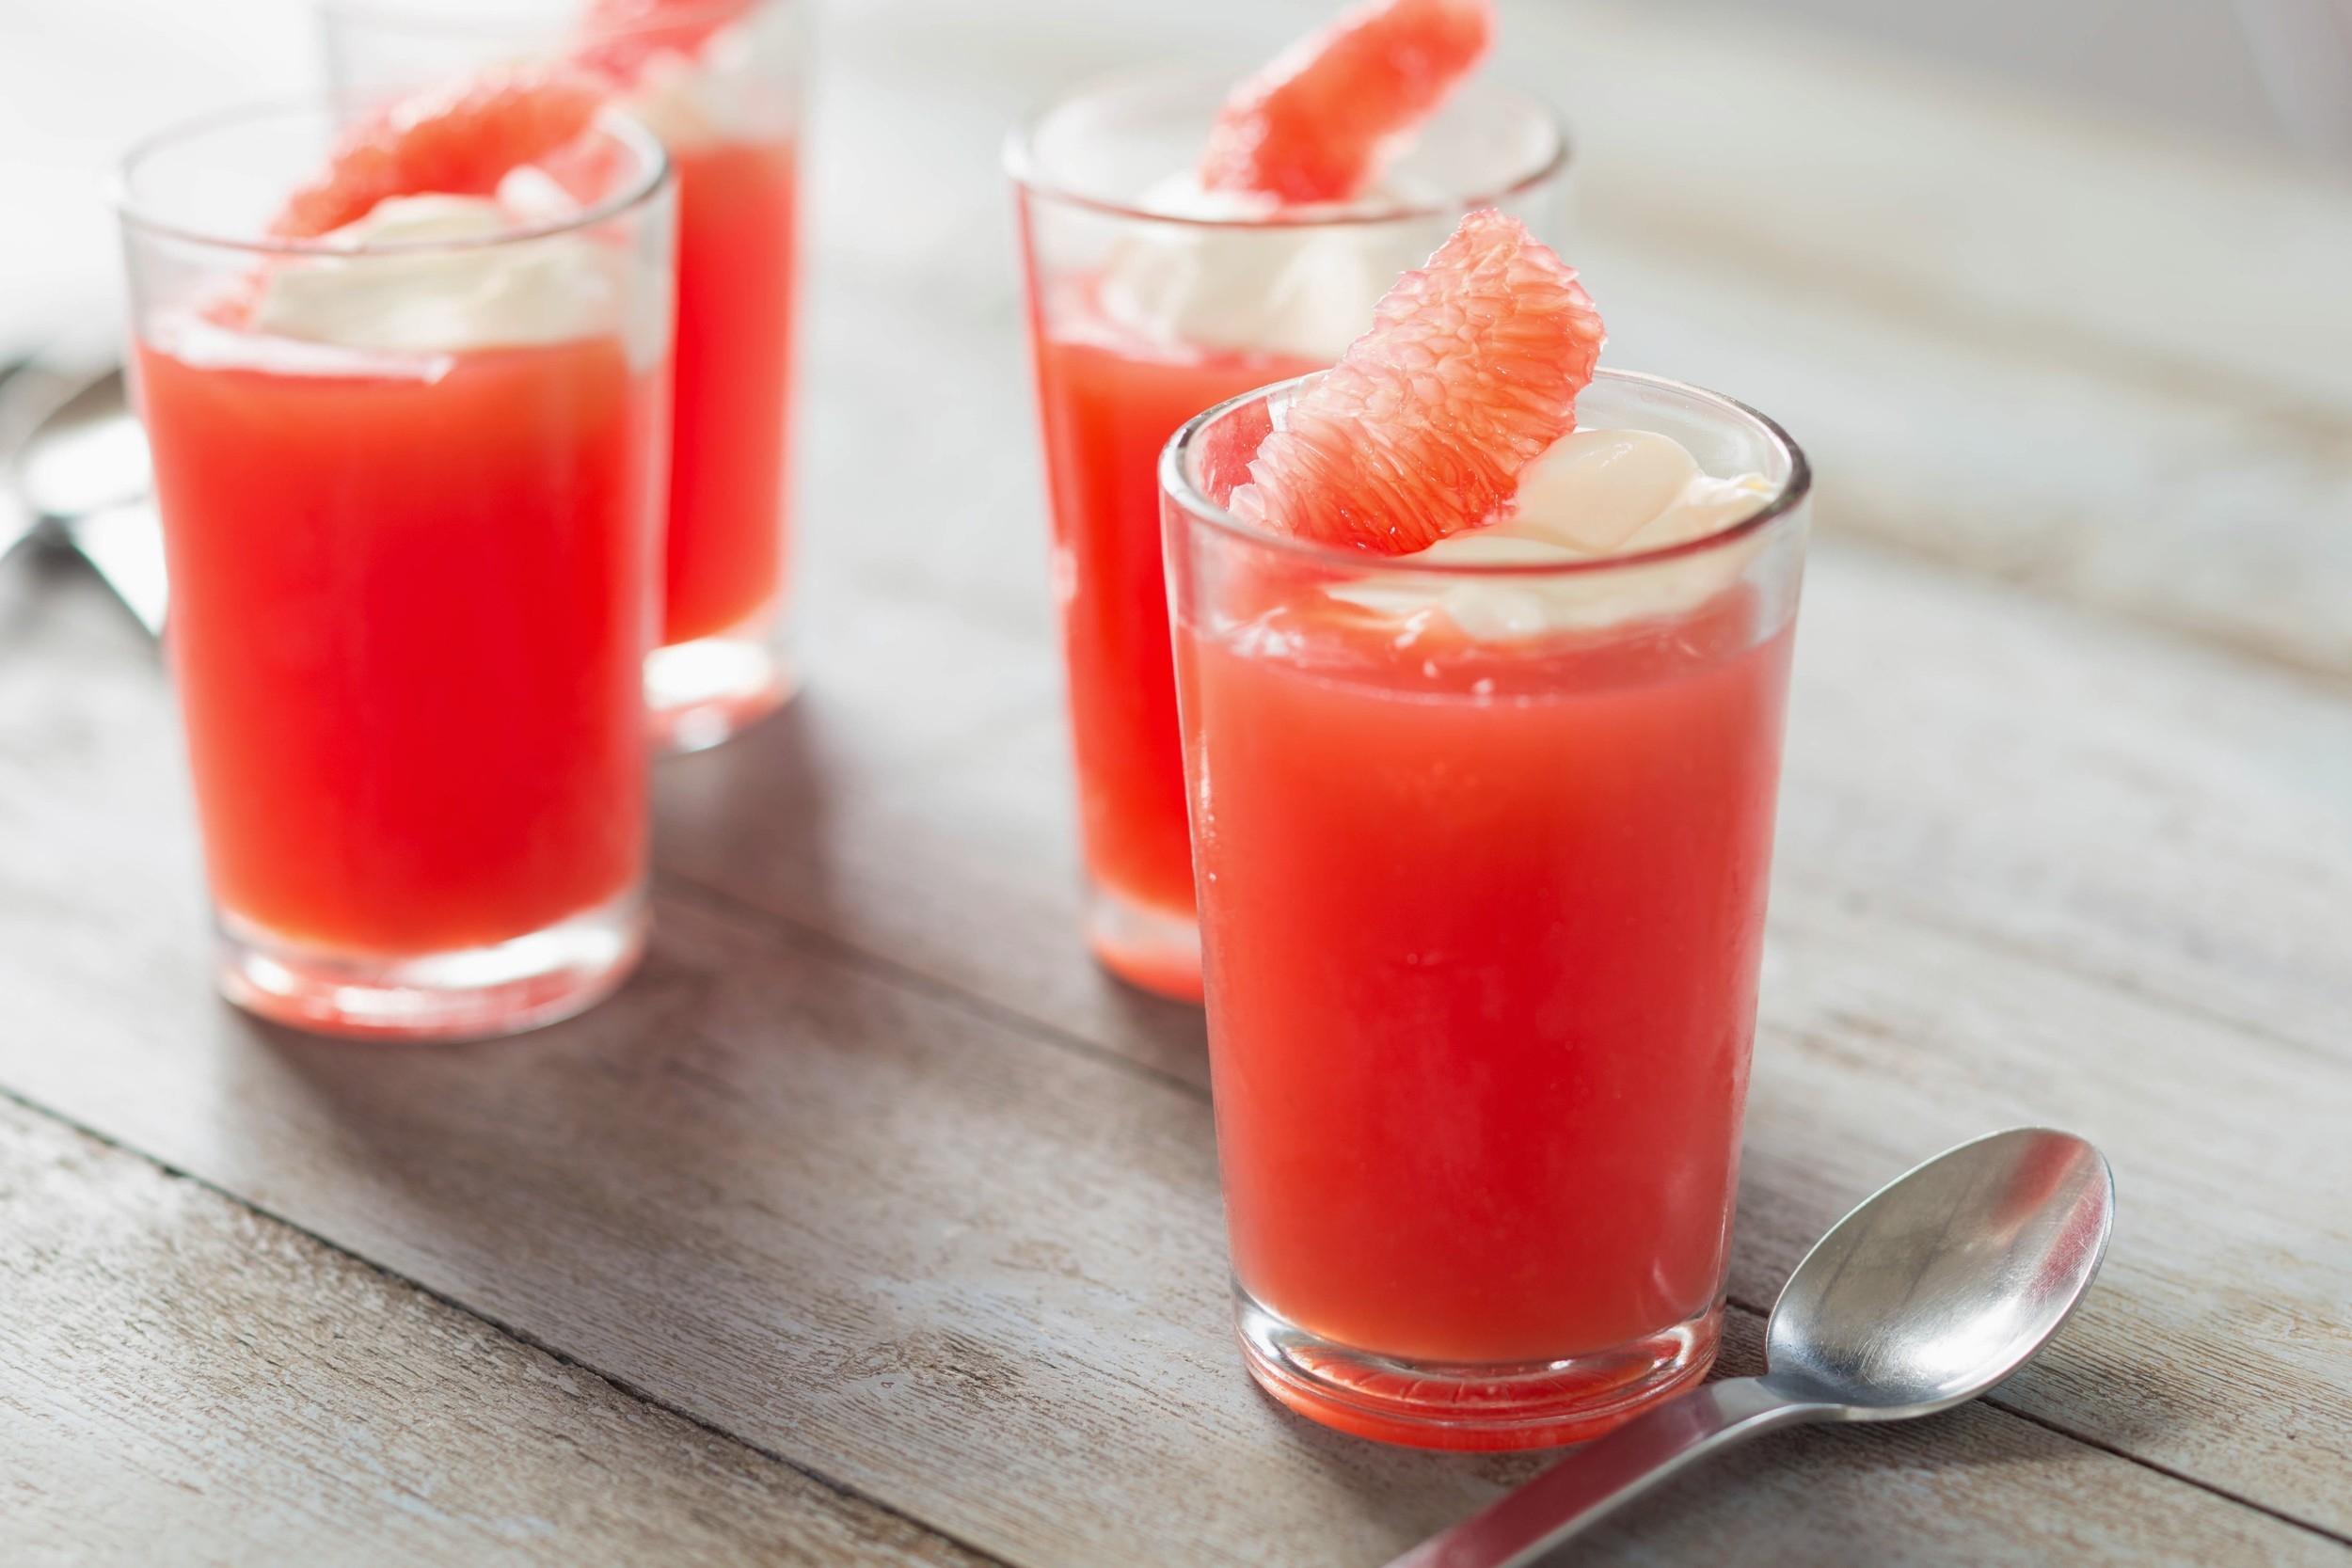 Grapefruit & campari jelly